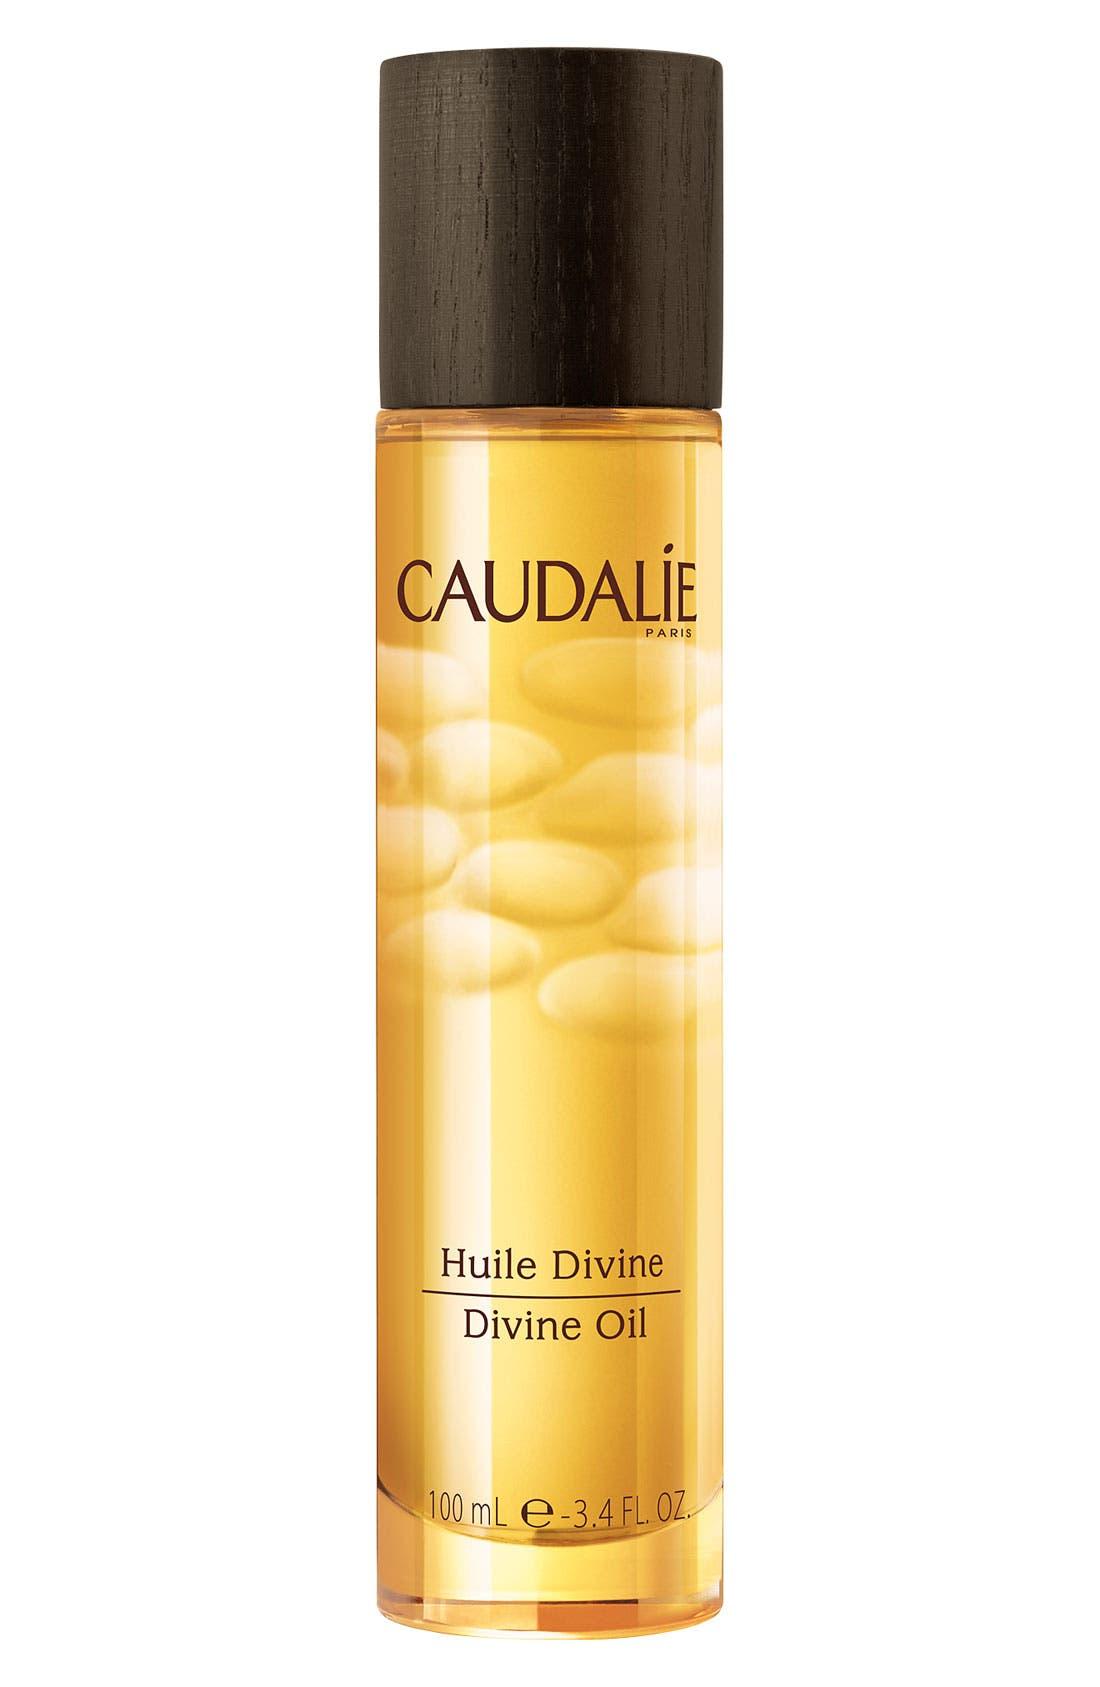 CAUDALÍE Divine Oil